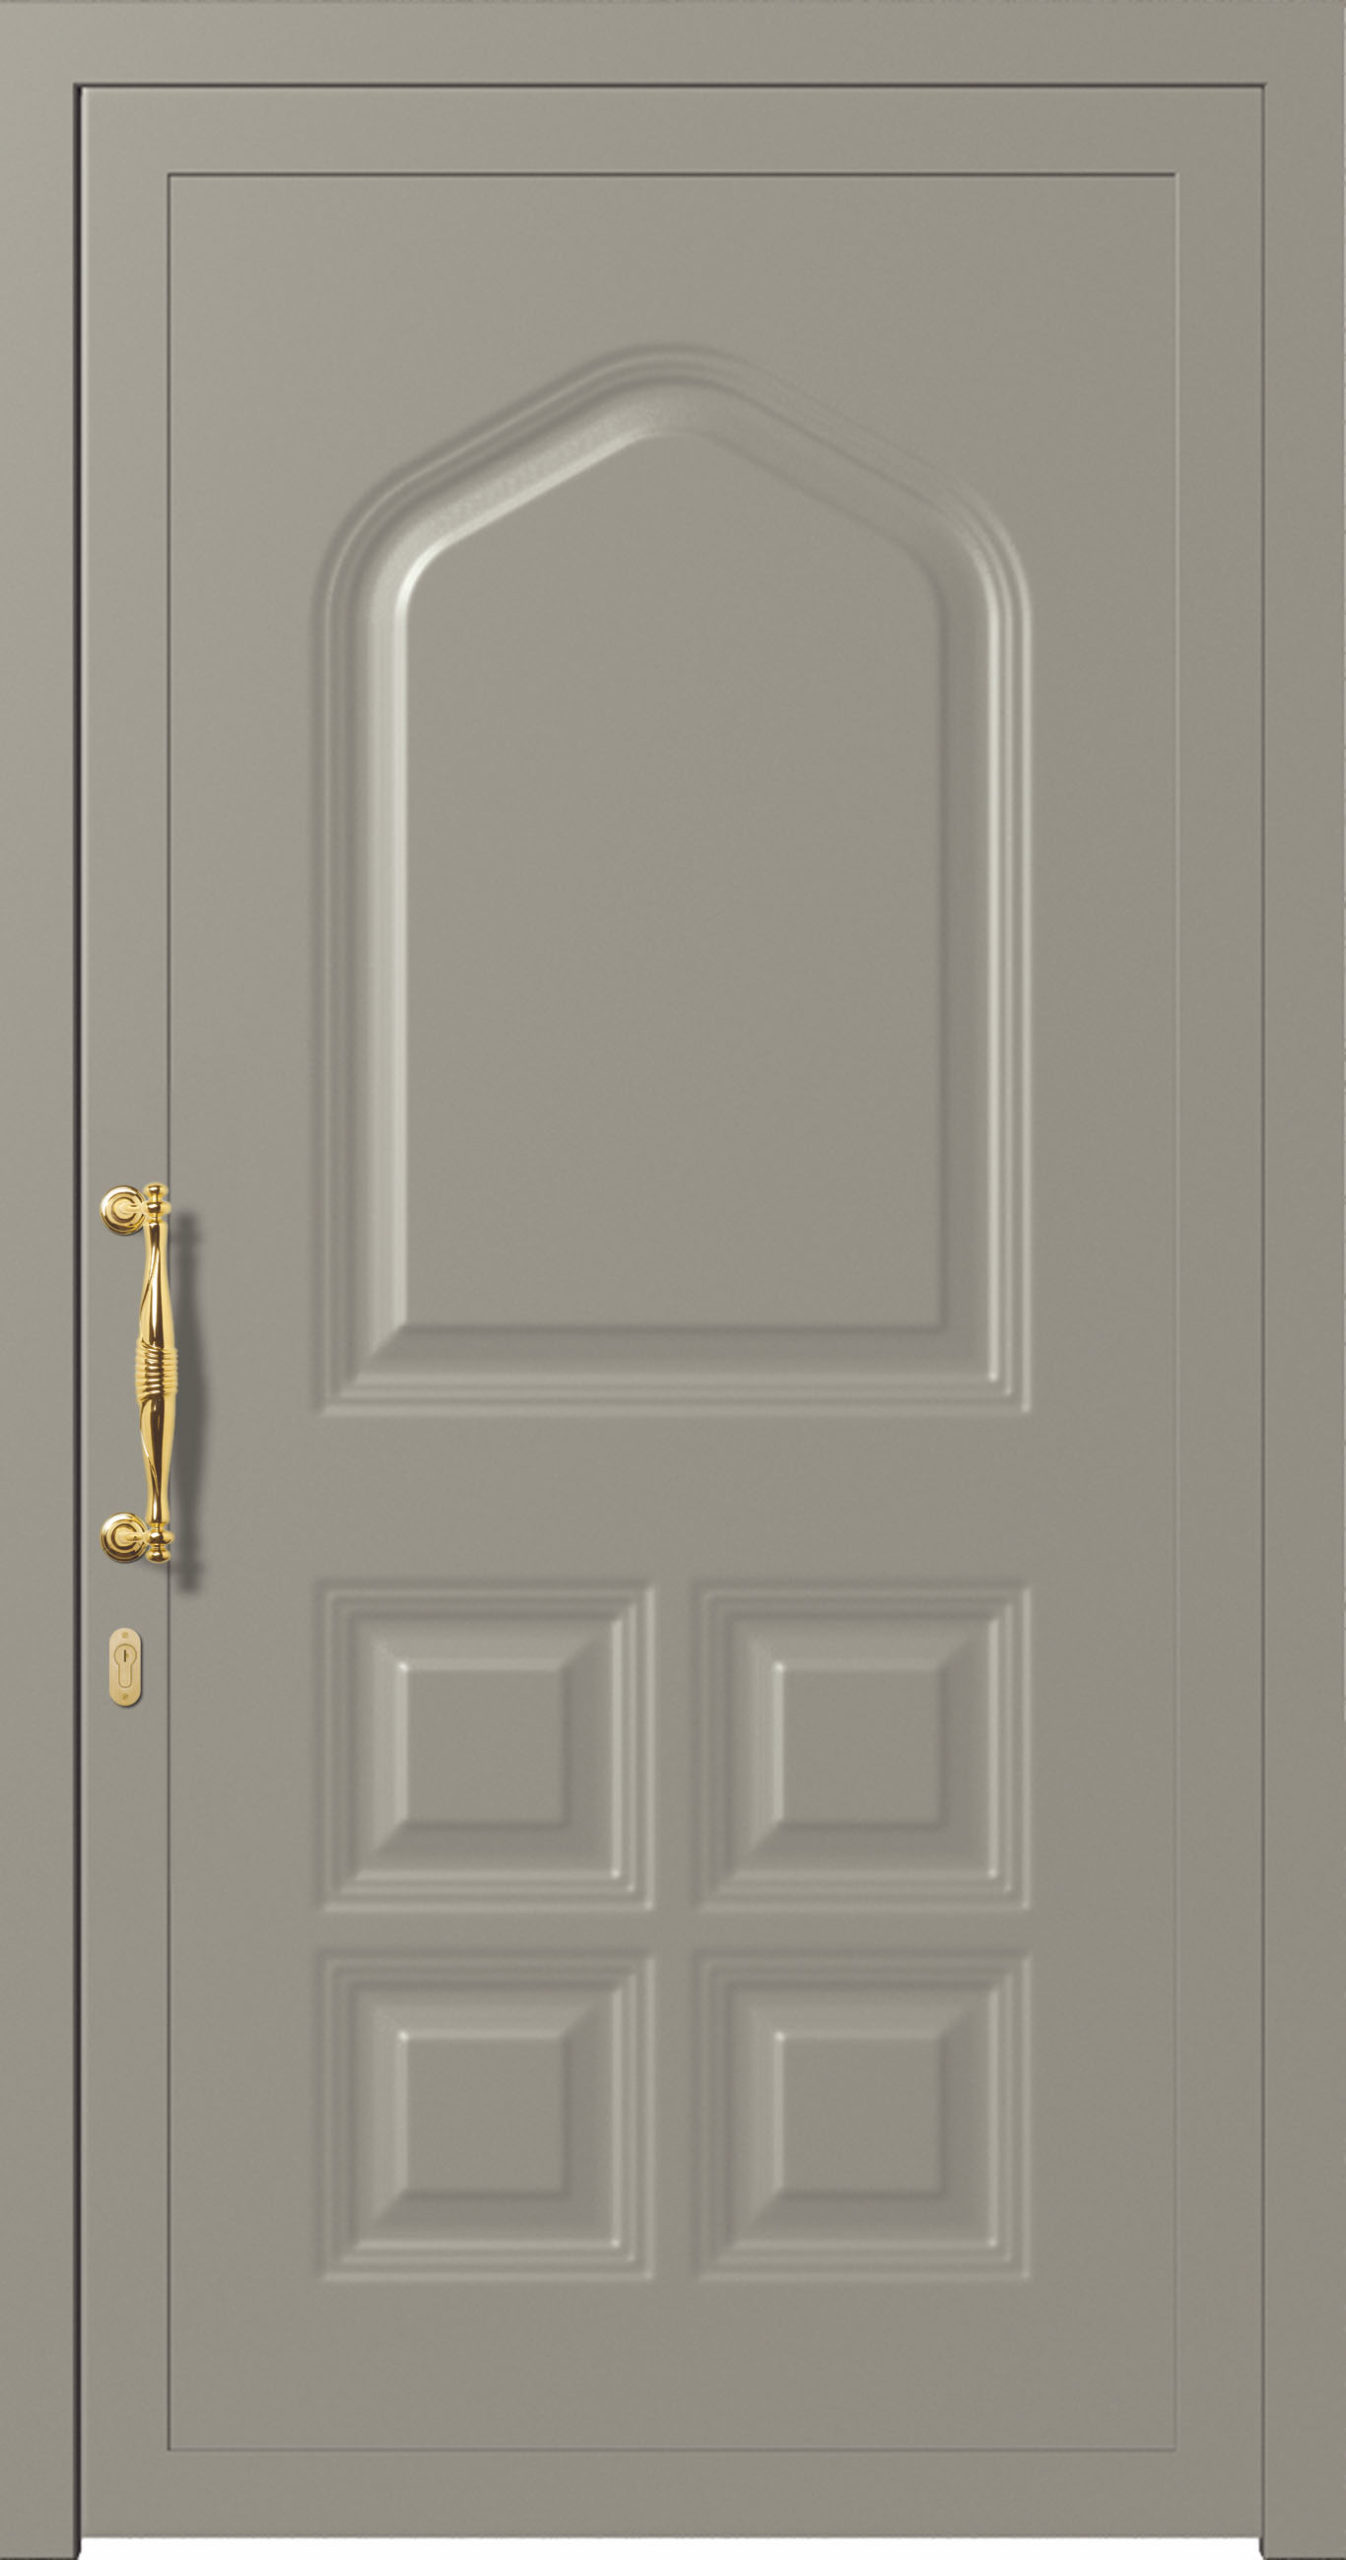 Entry Doors Linea Classica 114